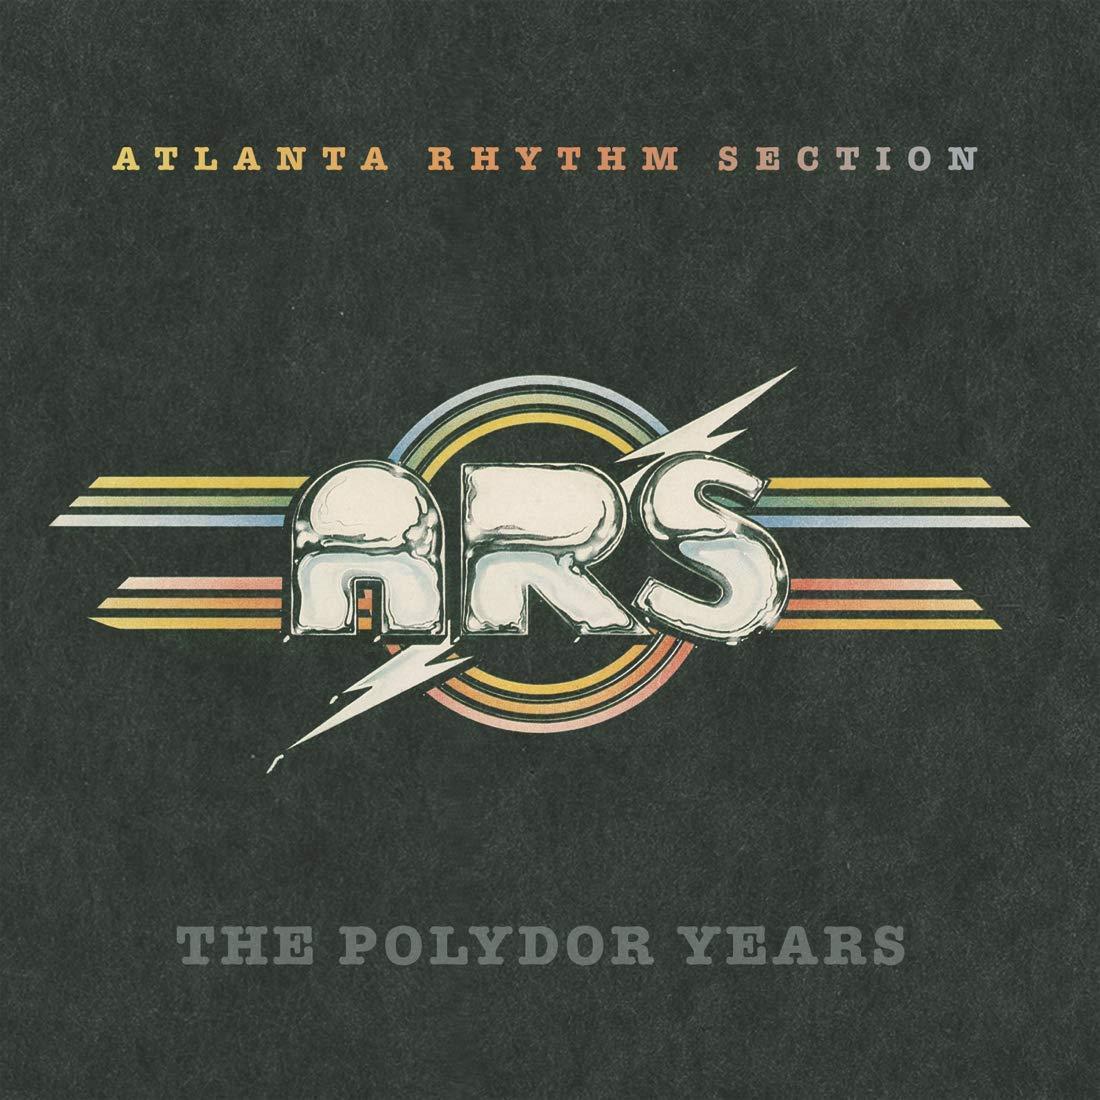 Atlanta-Rhythm-Section-The-Polydor-Years-8-CD-152205258